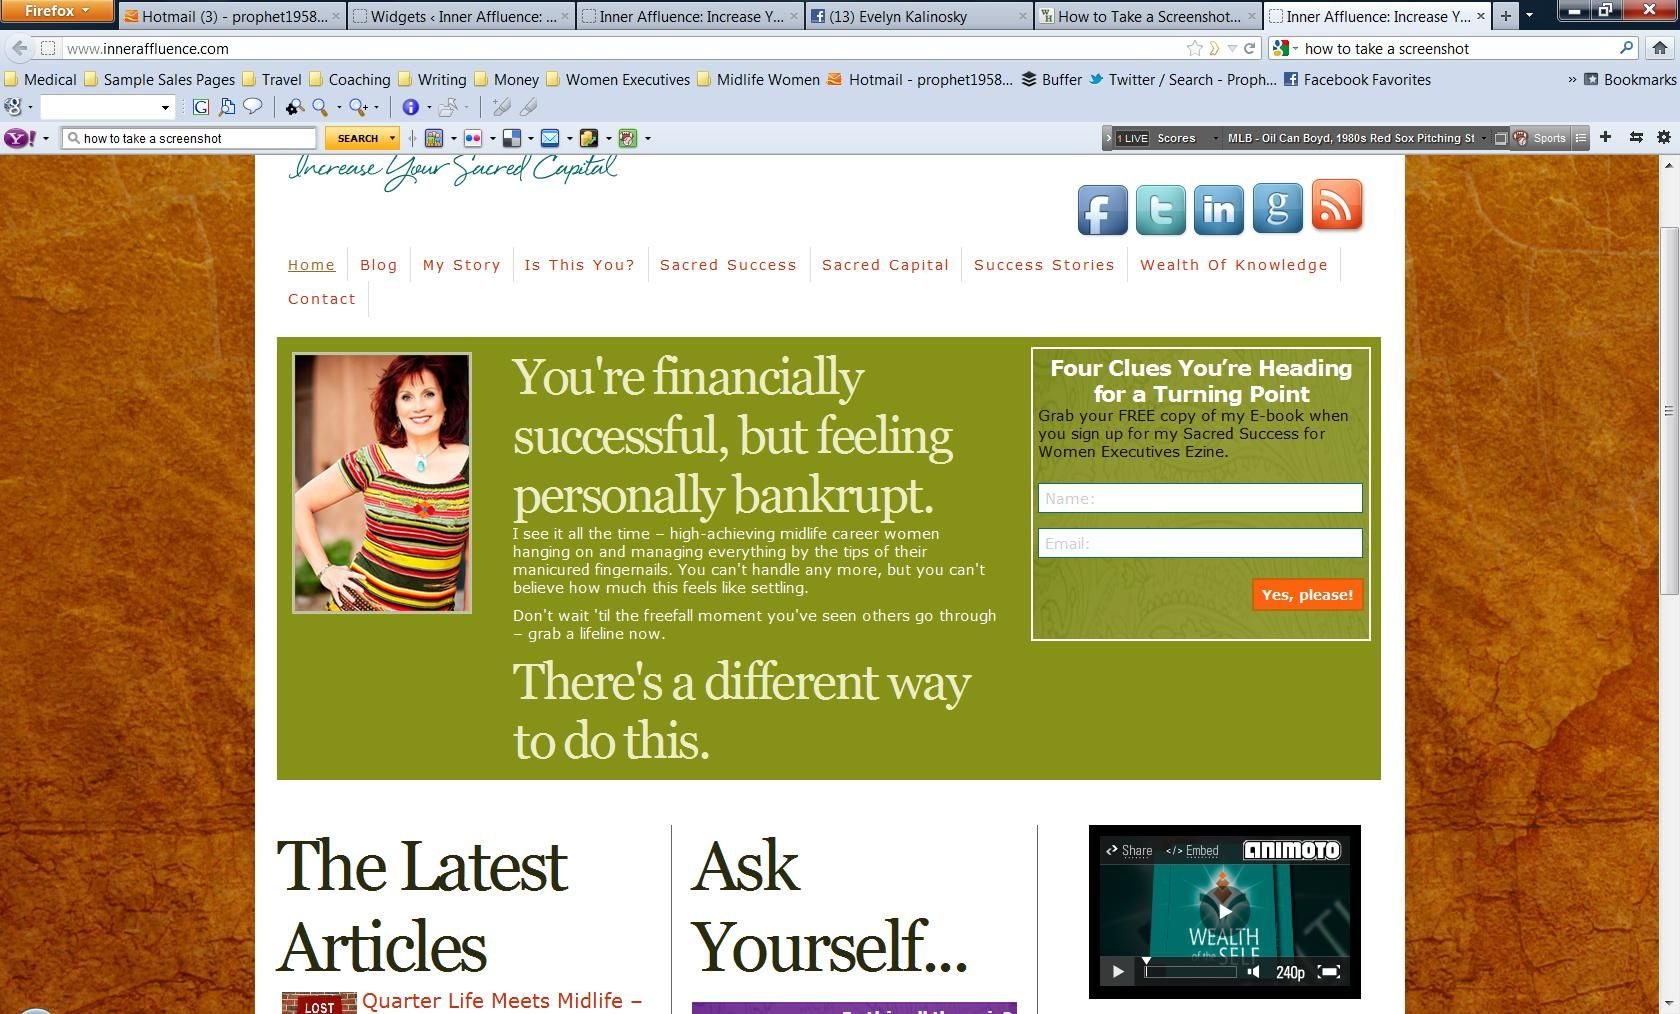 Inner Affluence new website design courtesy of VioletMinded Design. www.inneraffluence.com